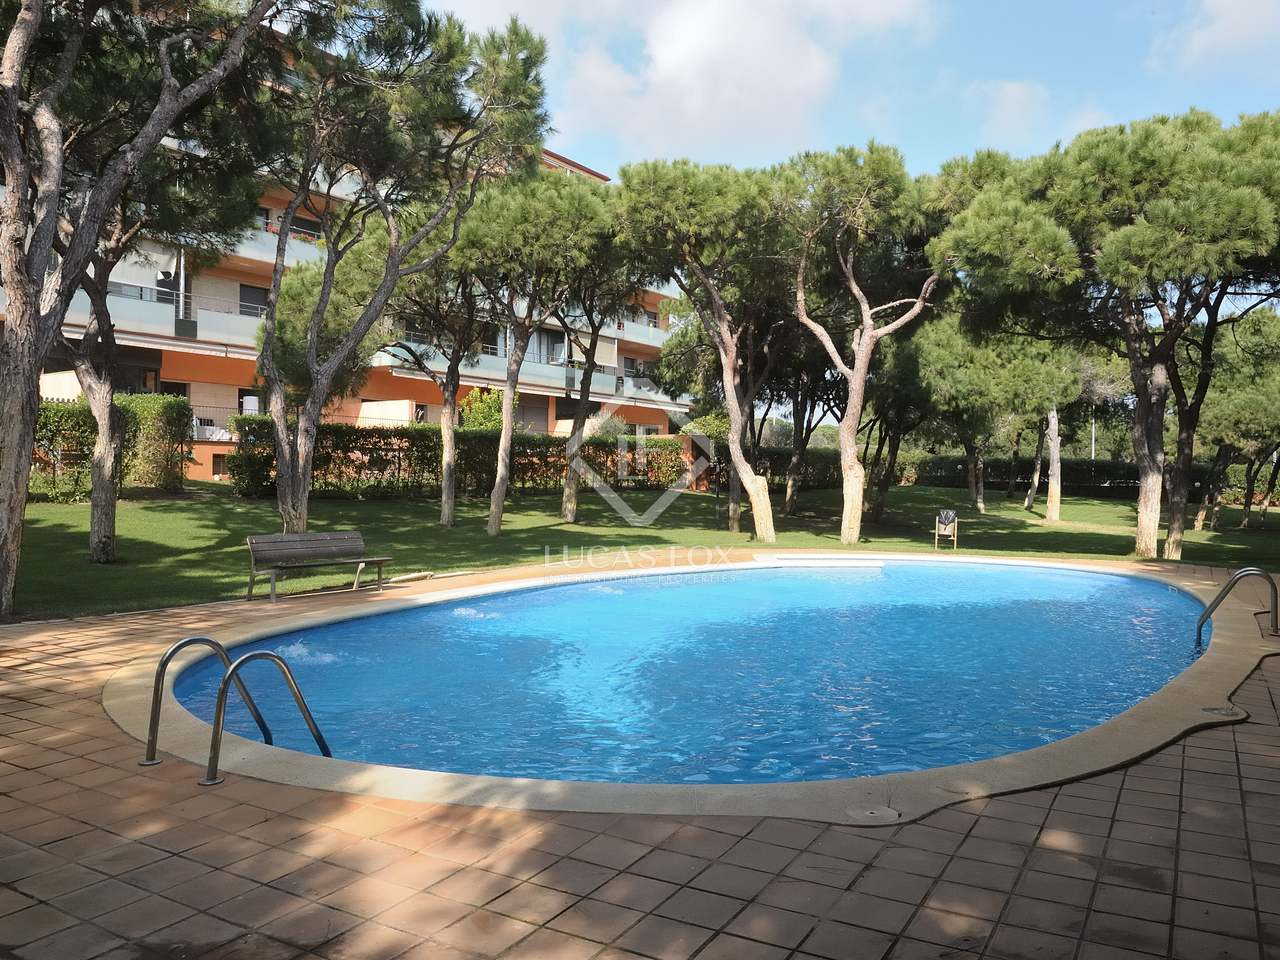 106 m apartment with 300 m garden for sale in gav mar for Barcelona pool garden 4